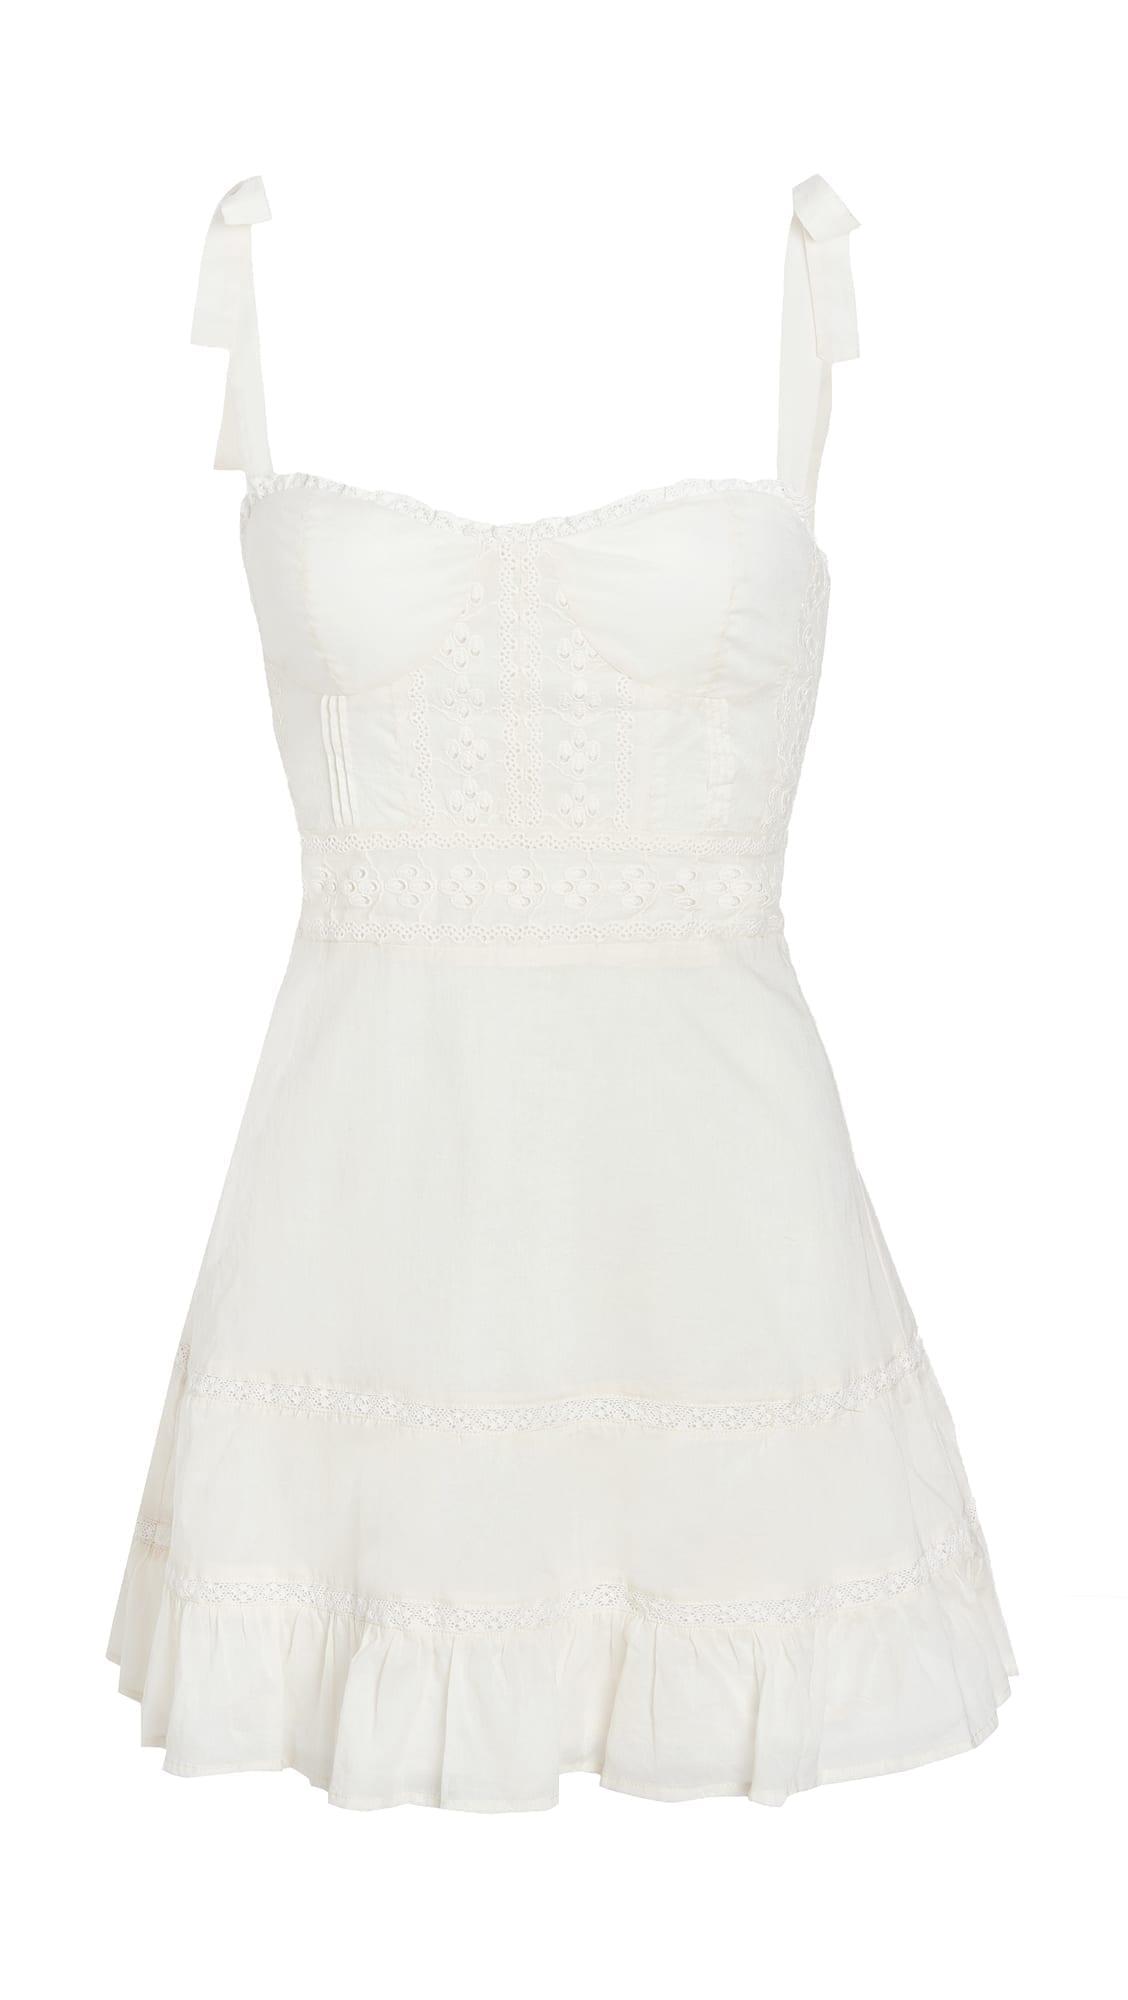 REFORMATION Maeve Dress